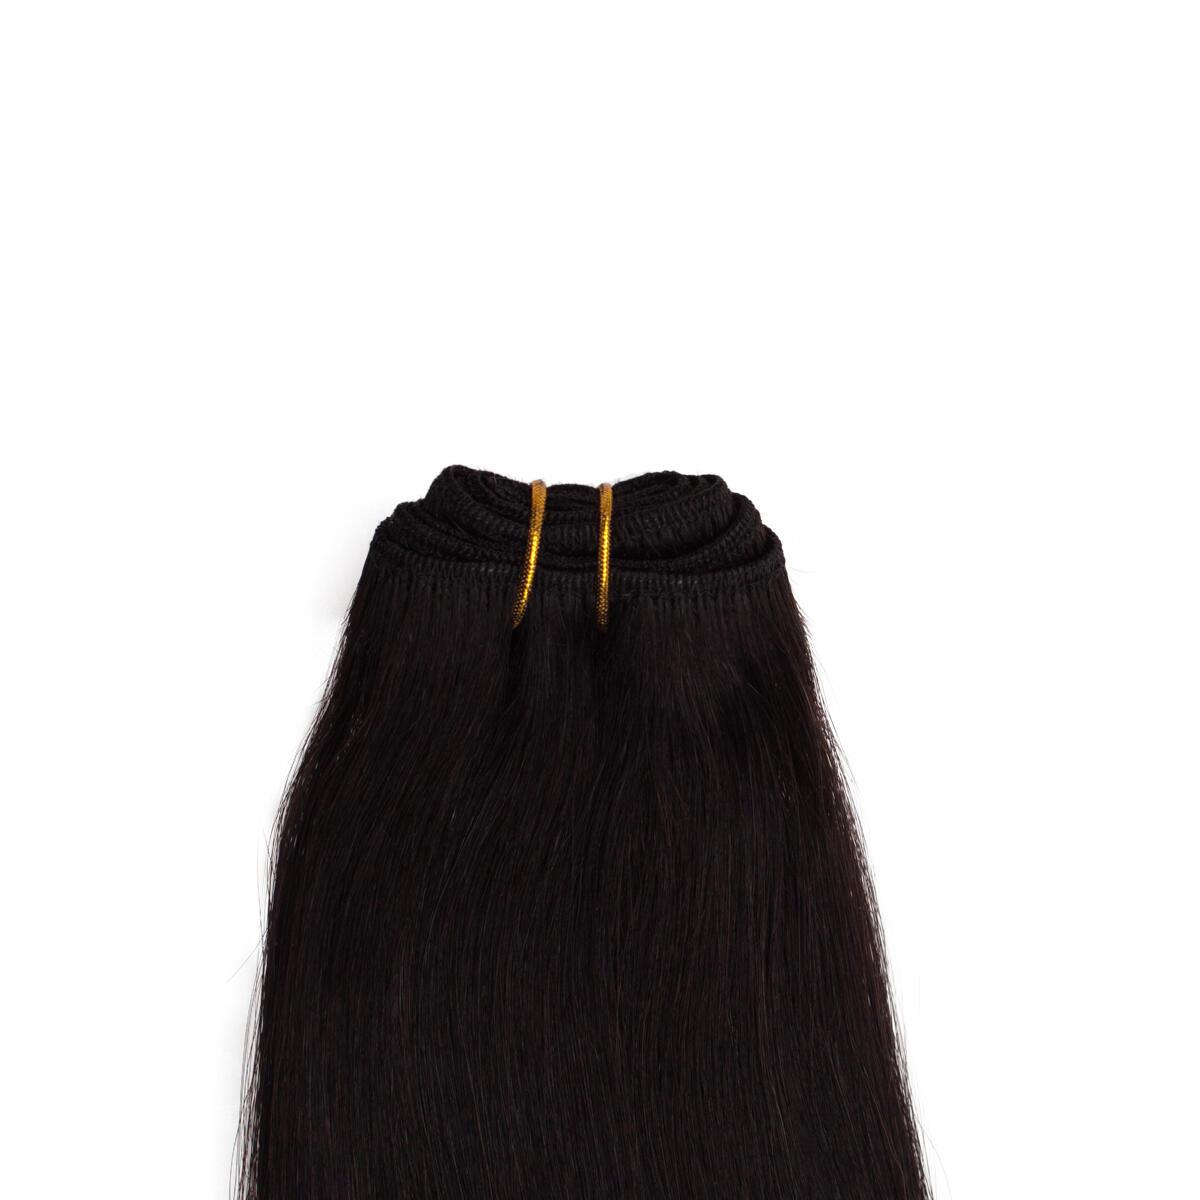 Hair Weft Original Straight 1.2 Black Brown 50 cm